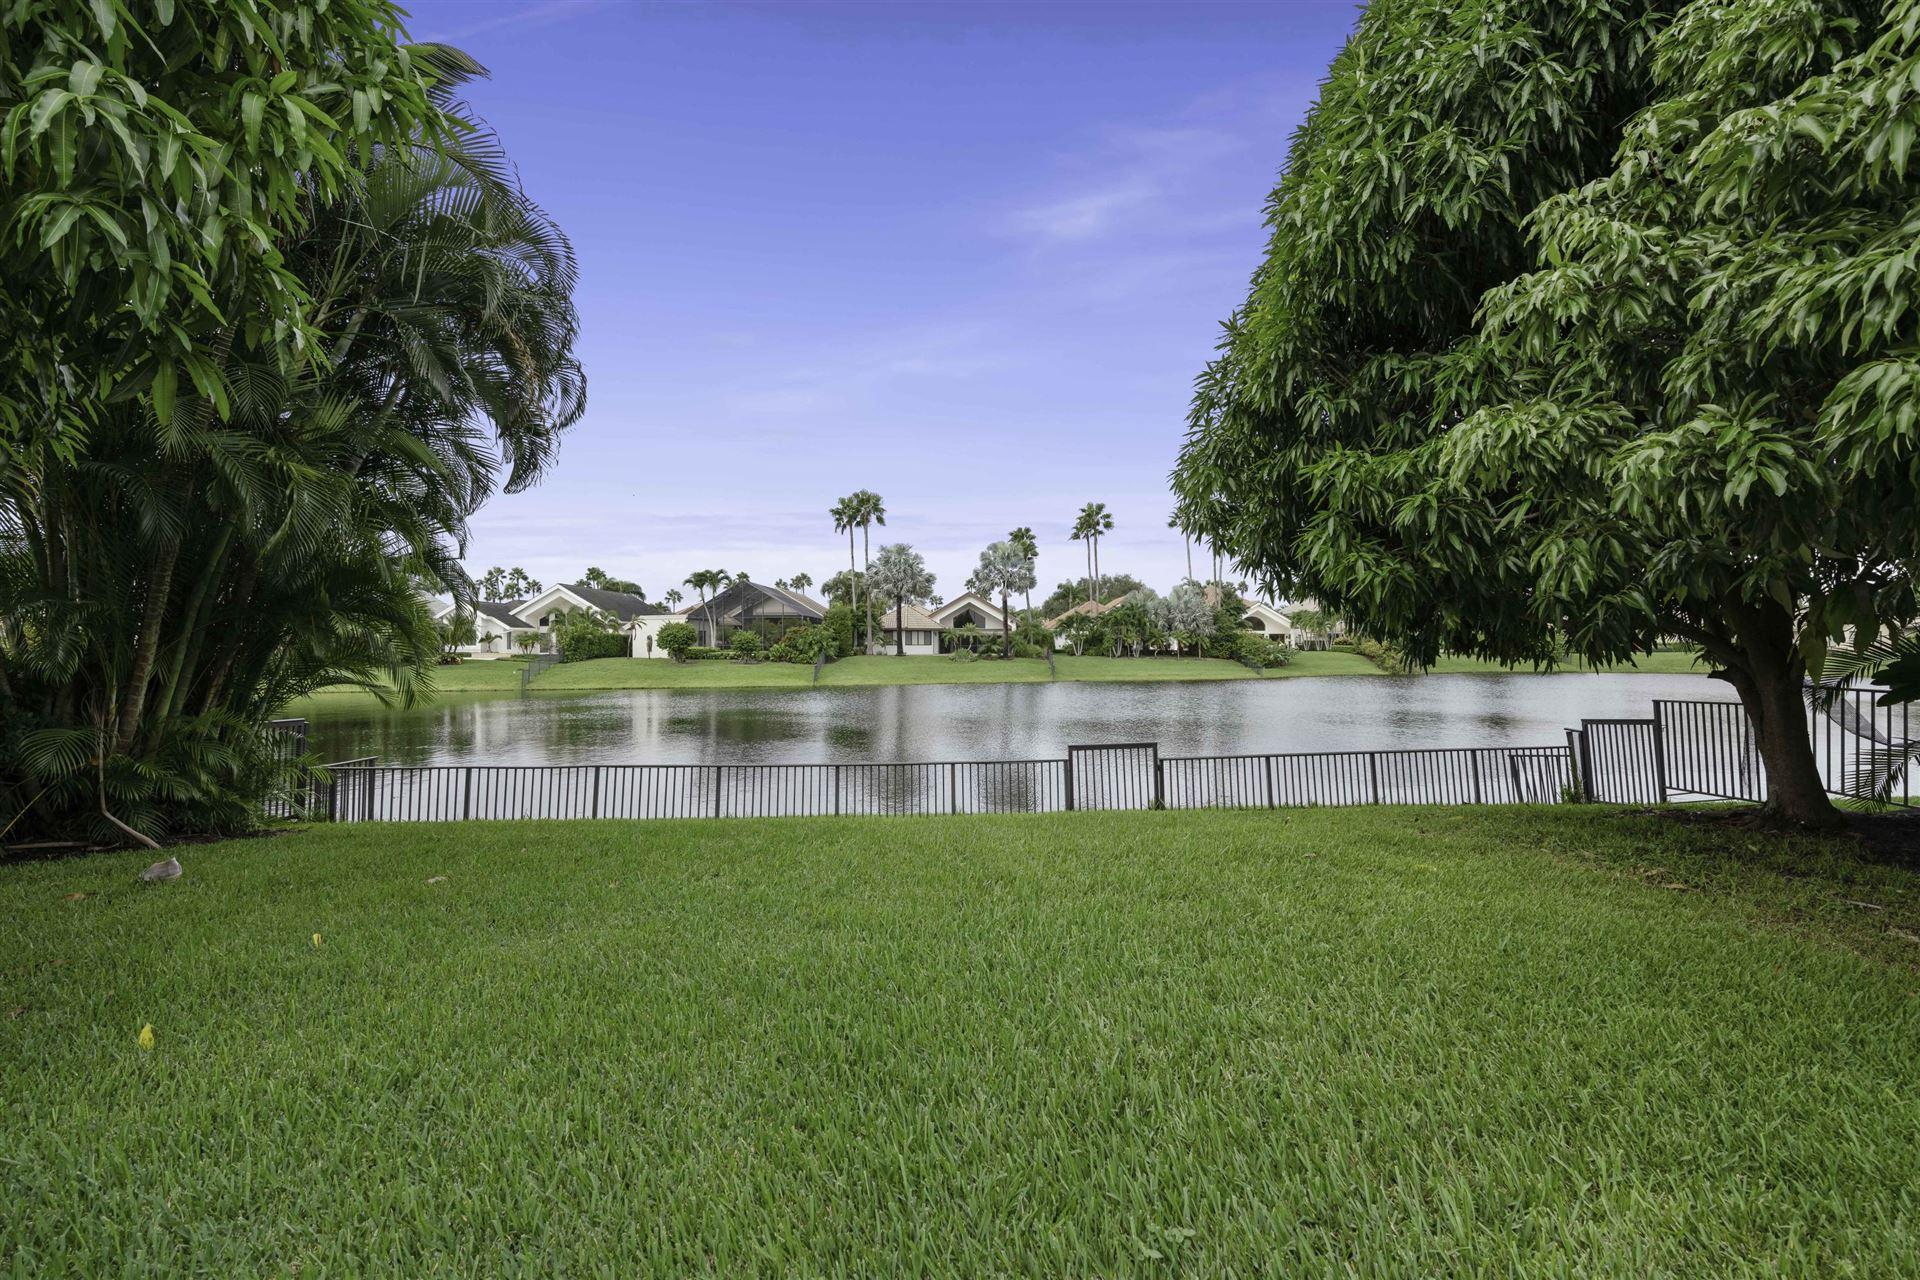 Photo of 13757 Le Havre Drive, Palm Beach Gardens, FL 33410 (MLS # RX-10668877)